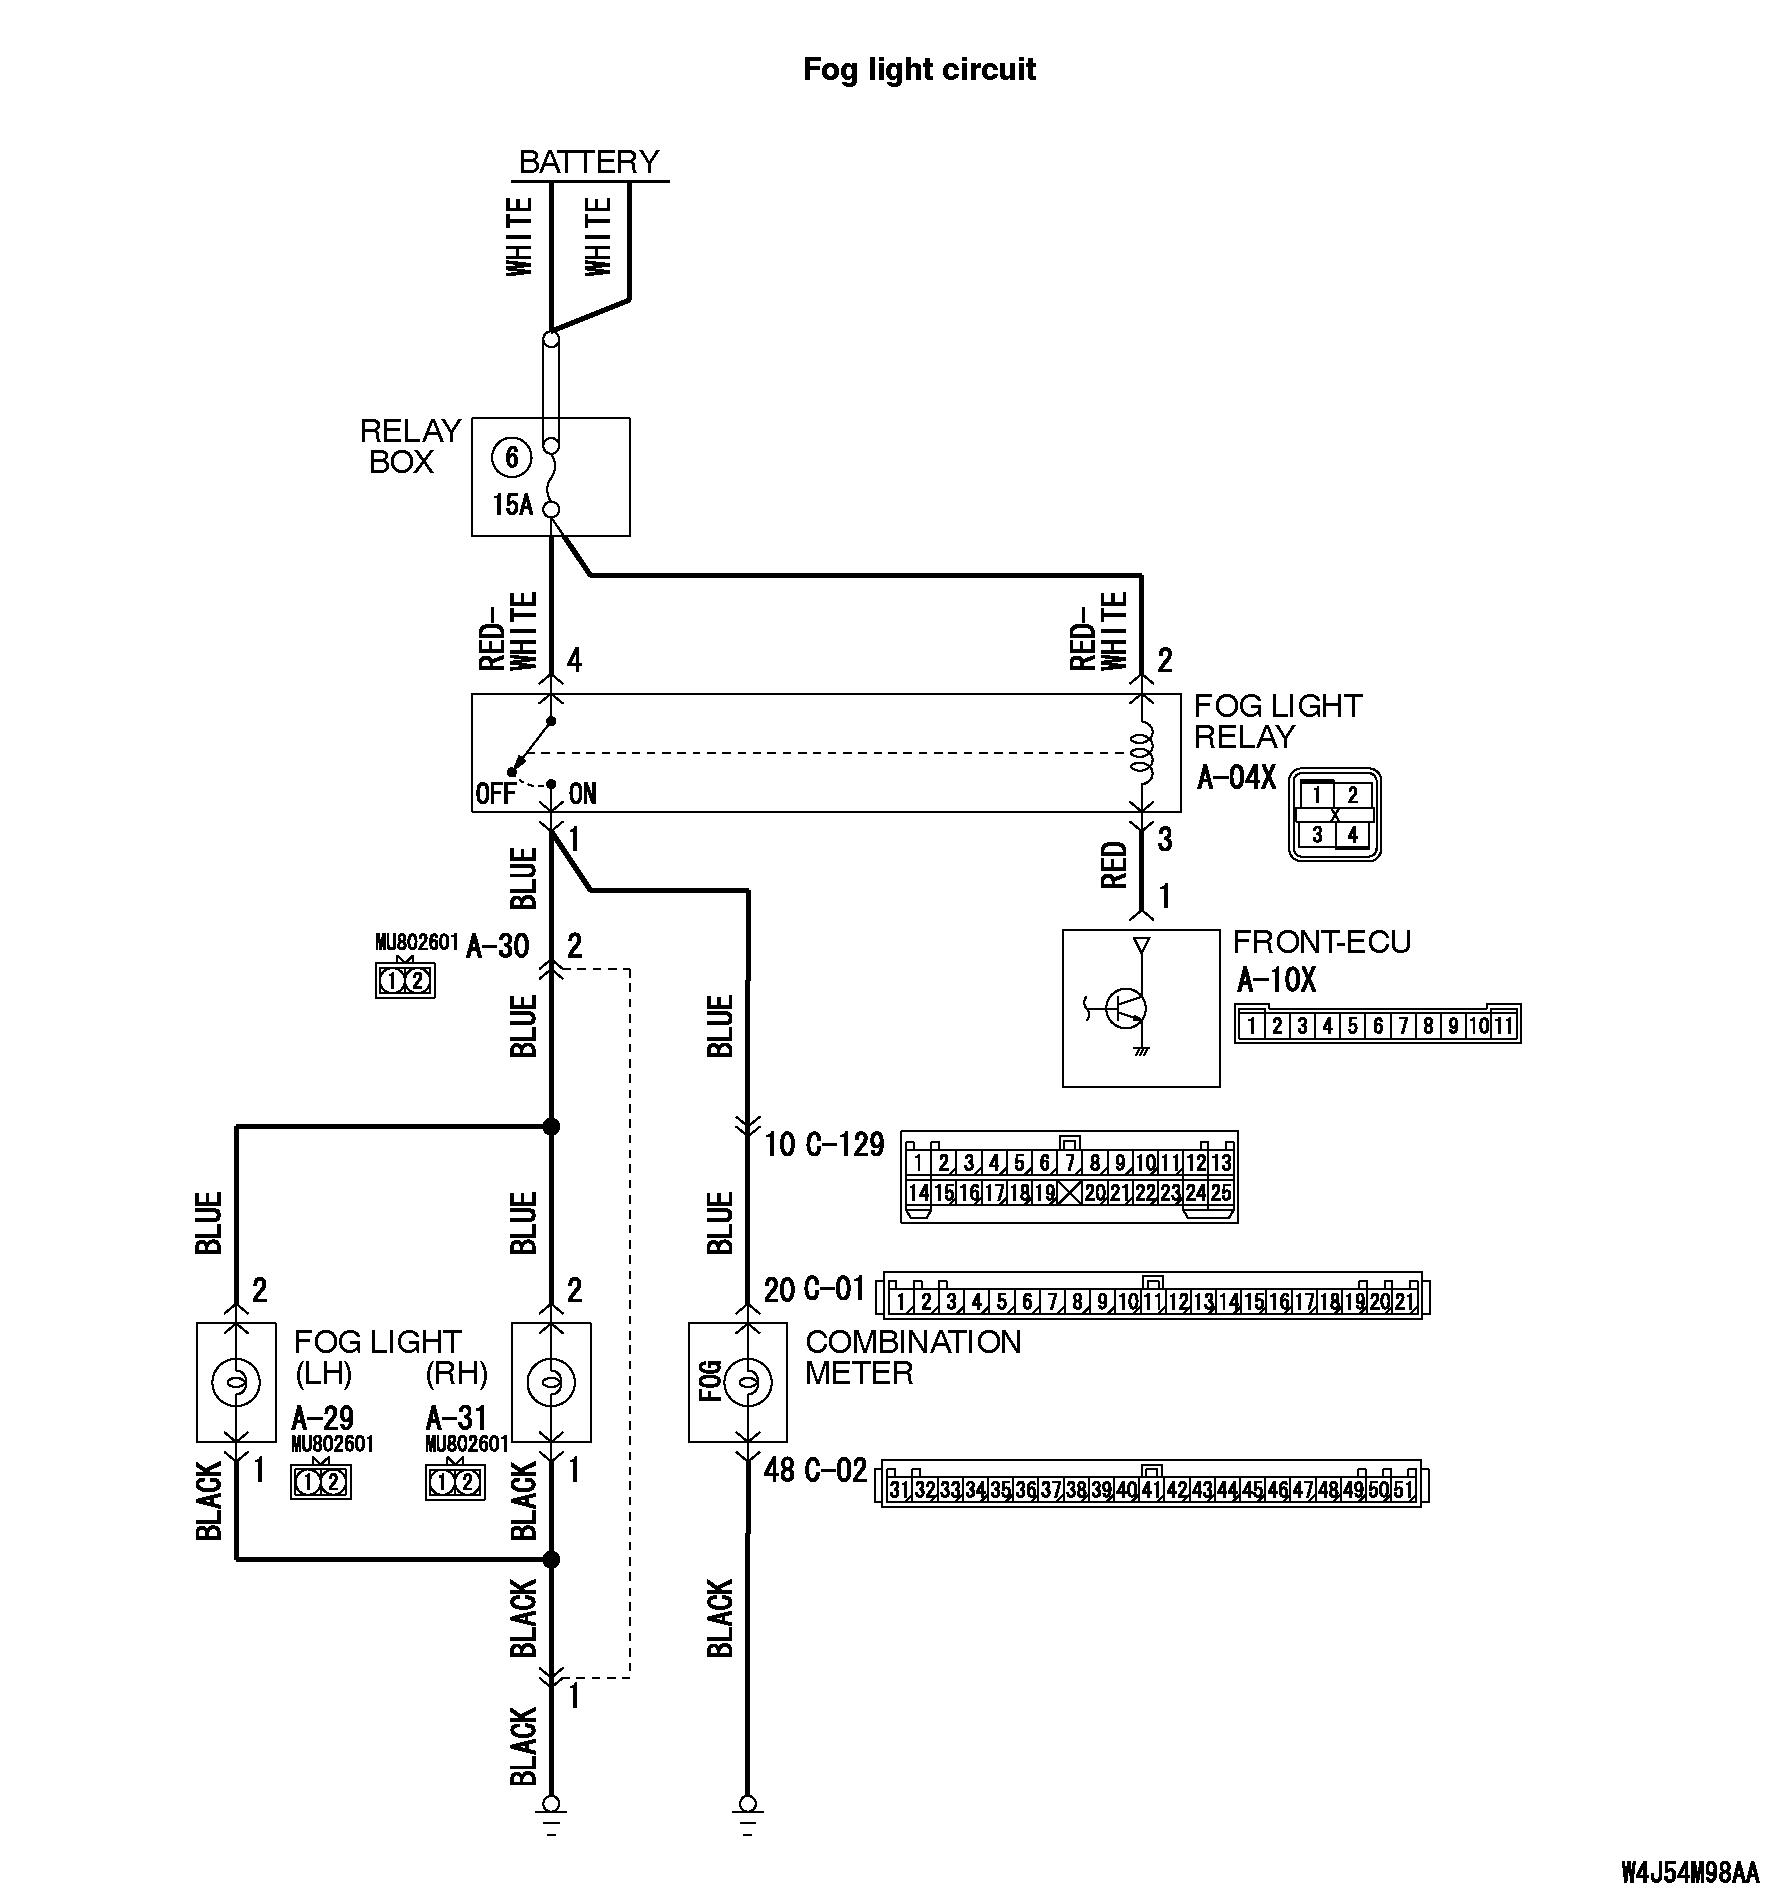 Jcb 940 Wiring Diagram Jcb 525 50 Wirng Diagram Jcb Skid Steer – Jcb 525 50 Wiring Diagram